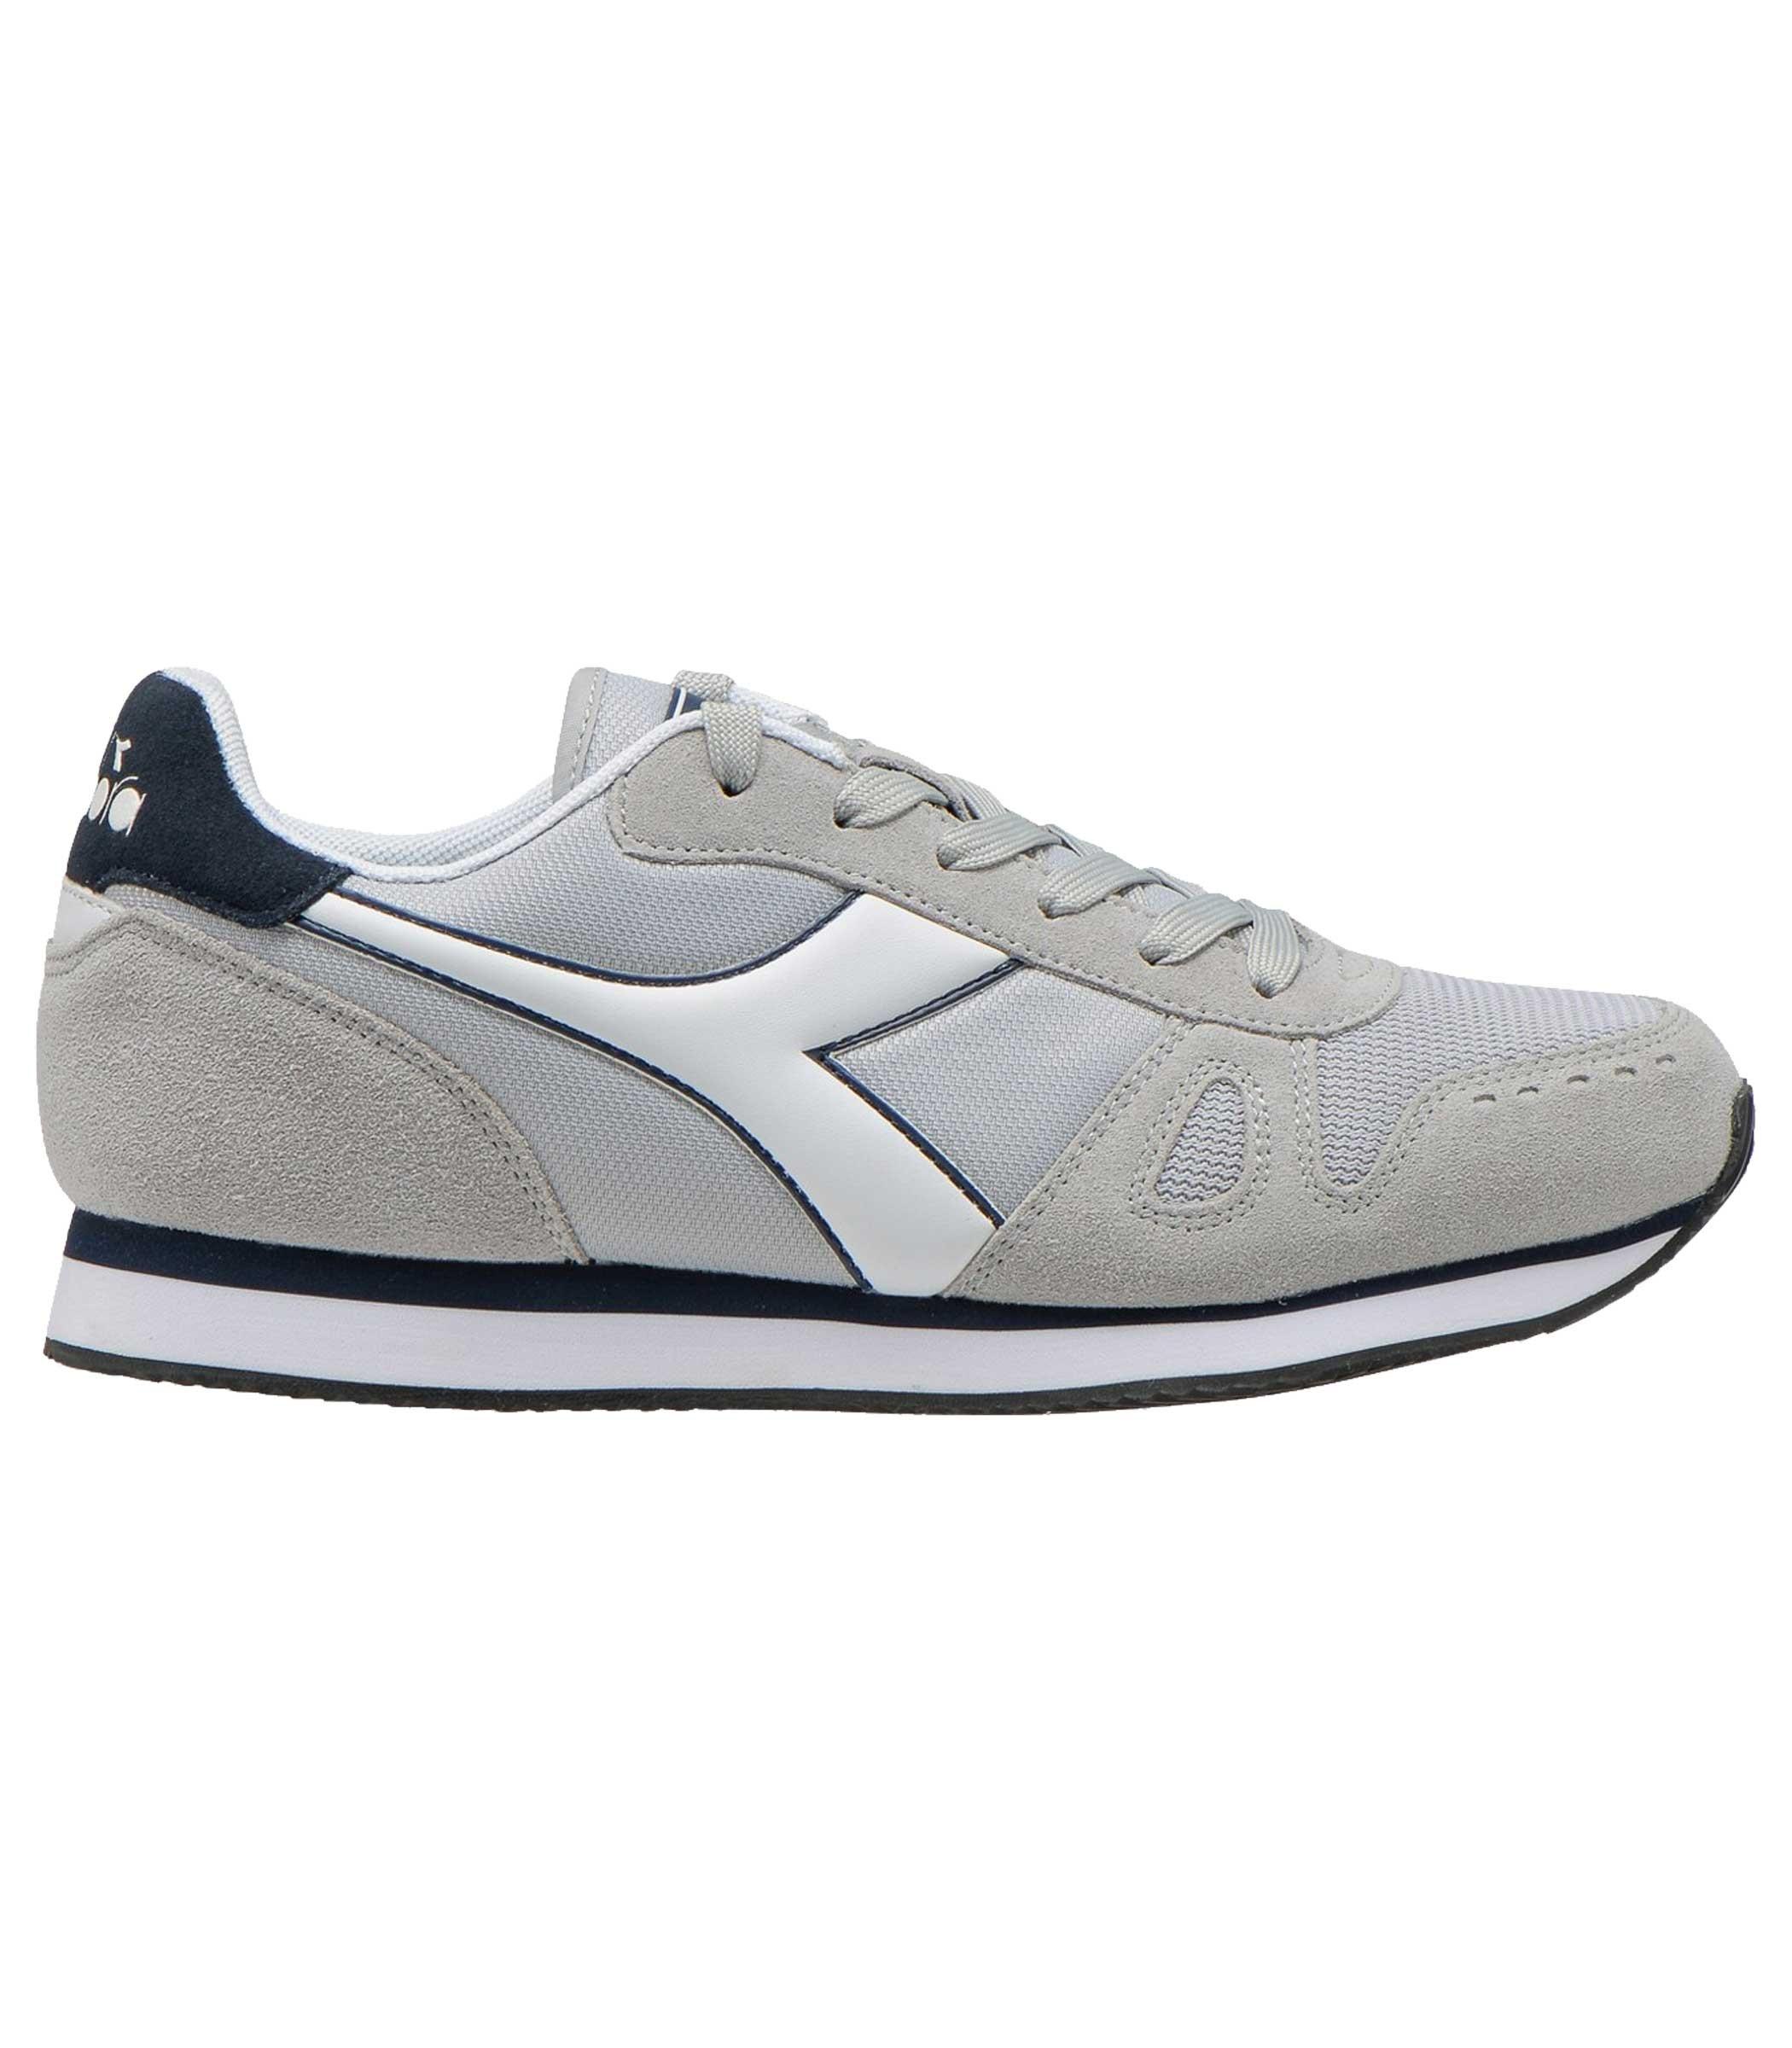 Uomo Simple Run Diadora Sneakers 173745 Da Scarpe Rif 101 PS4qfwfn 25f820ab479